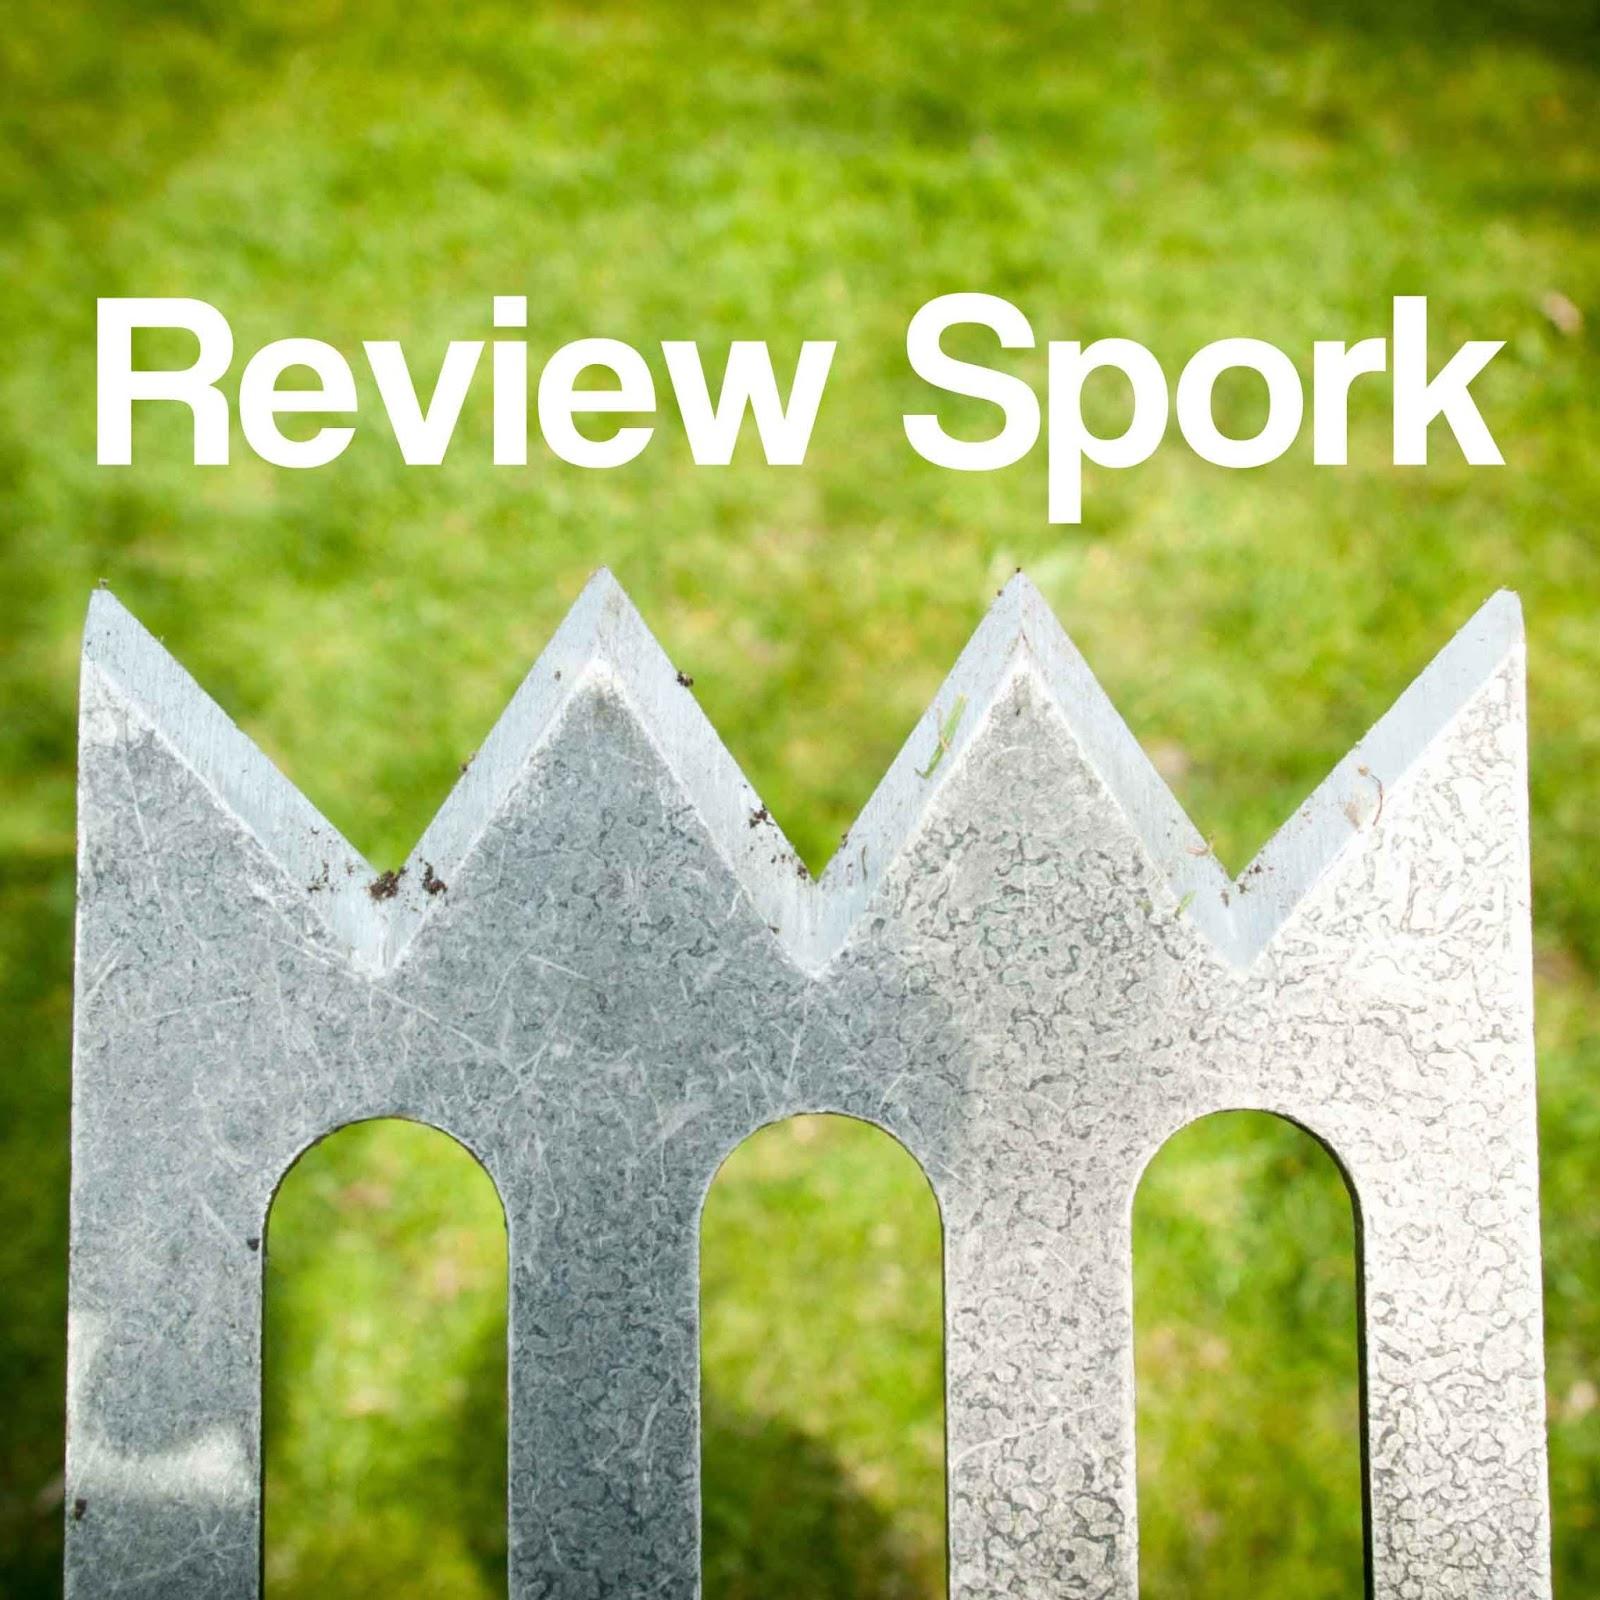 review spork spade fork moestuin tuingereedschap